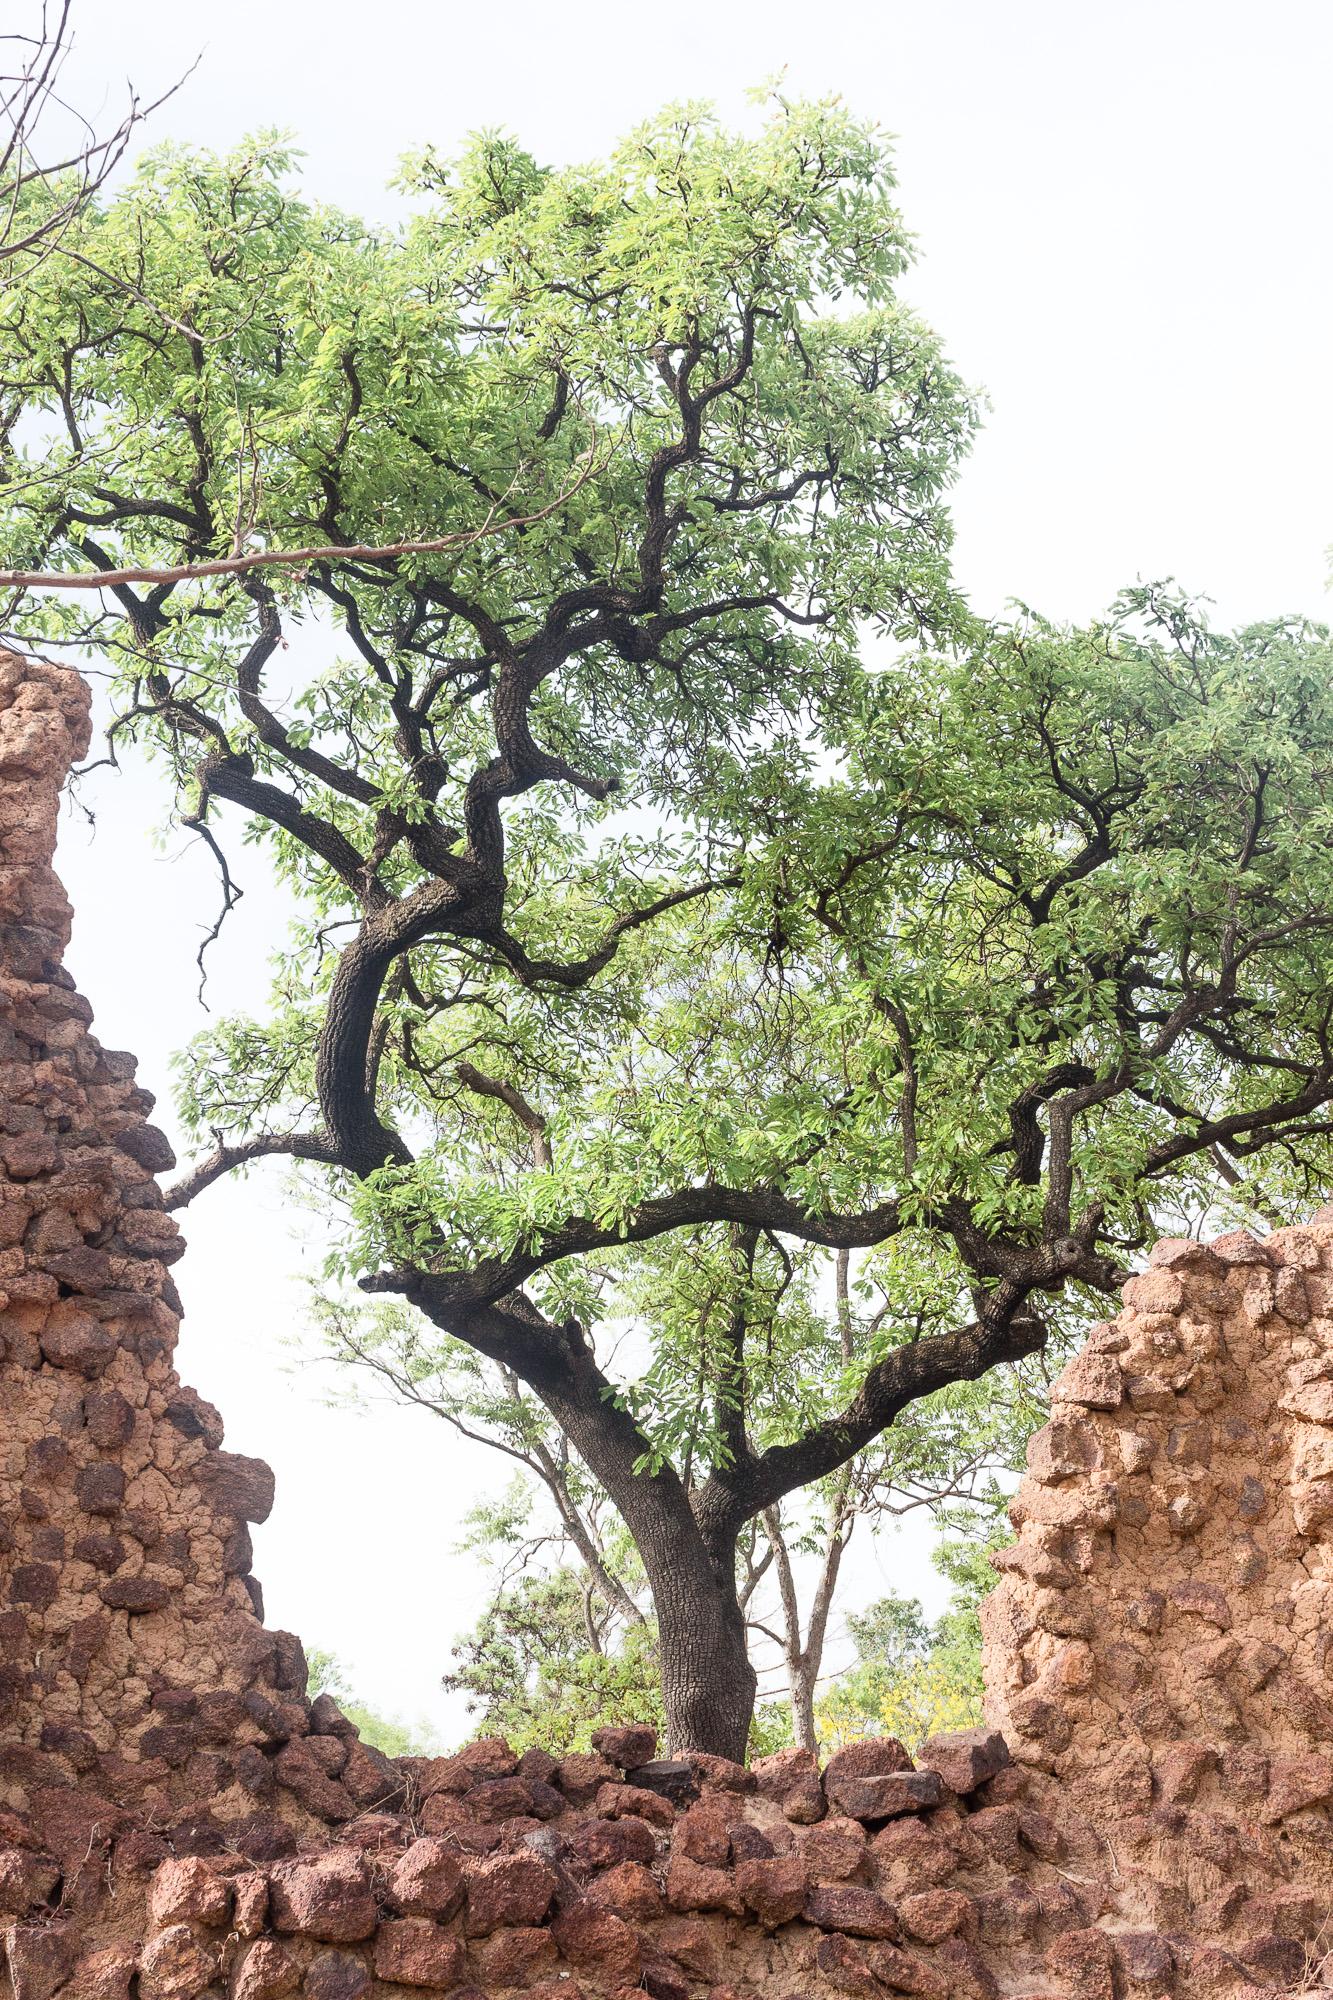 Arbre au milieu des ruines de Loropeni, Burkina Faso